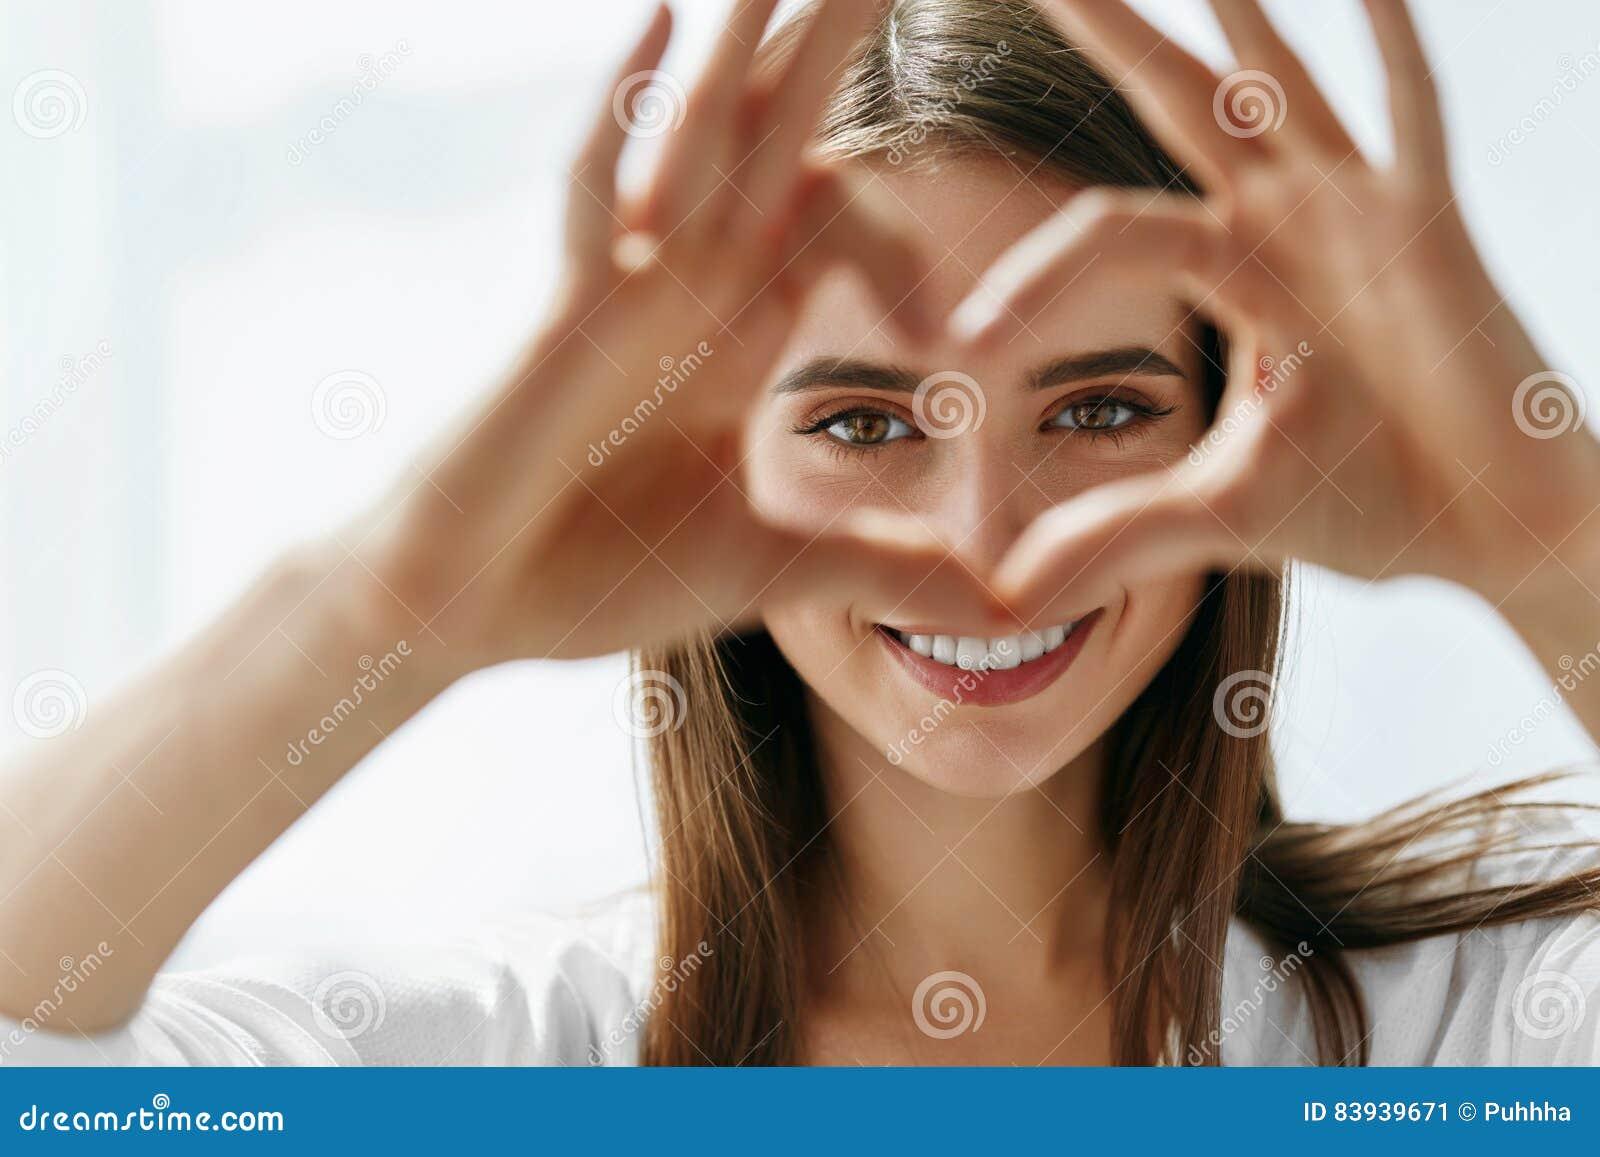 Beautiful Happy Woman Showing Love Sign Near Eyes.